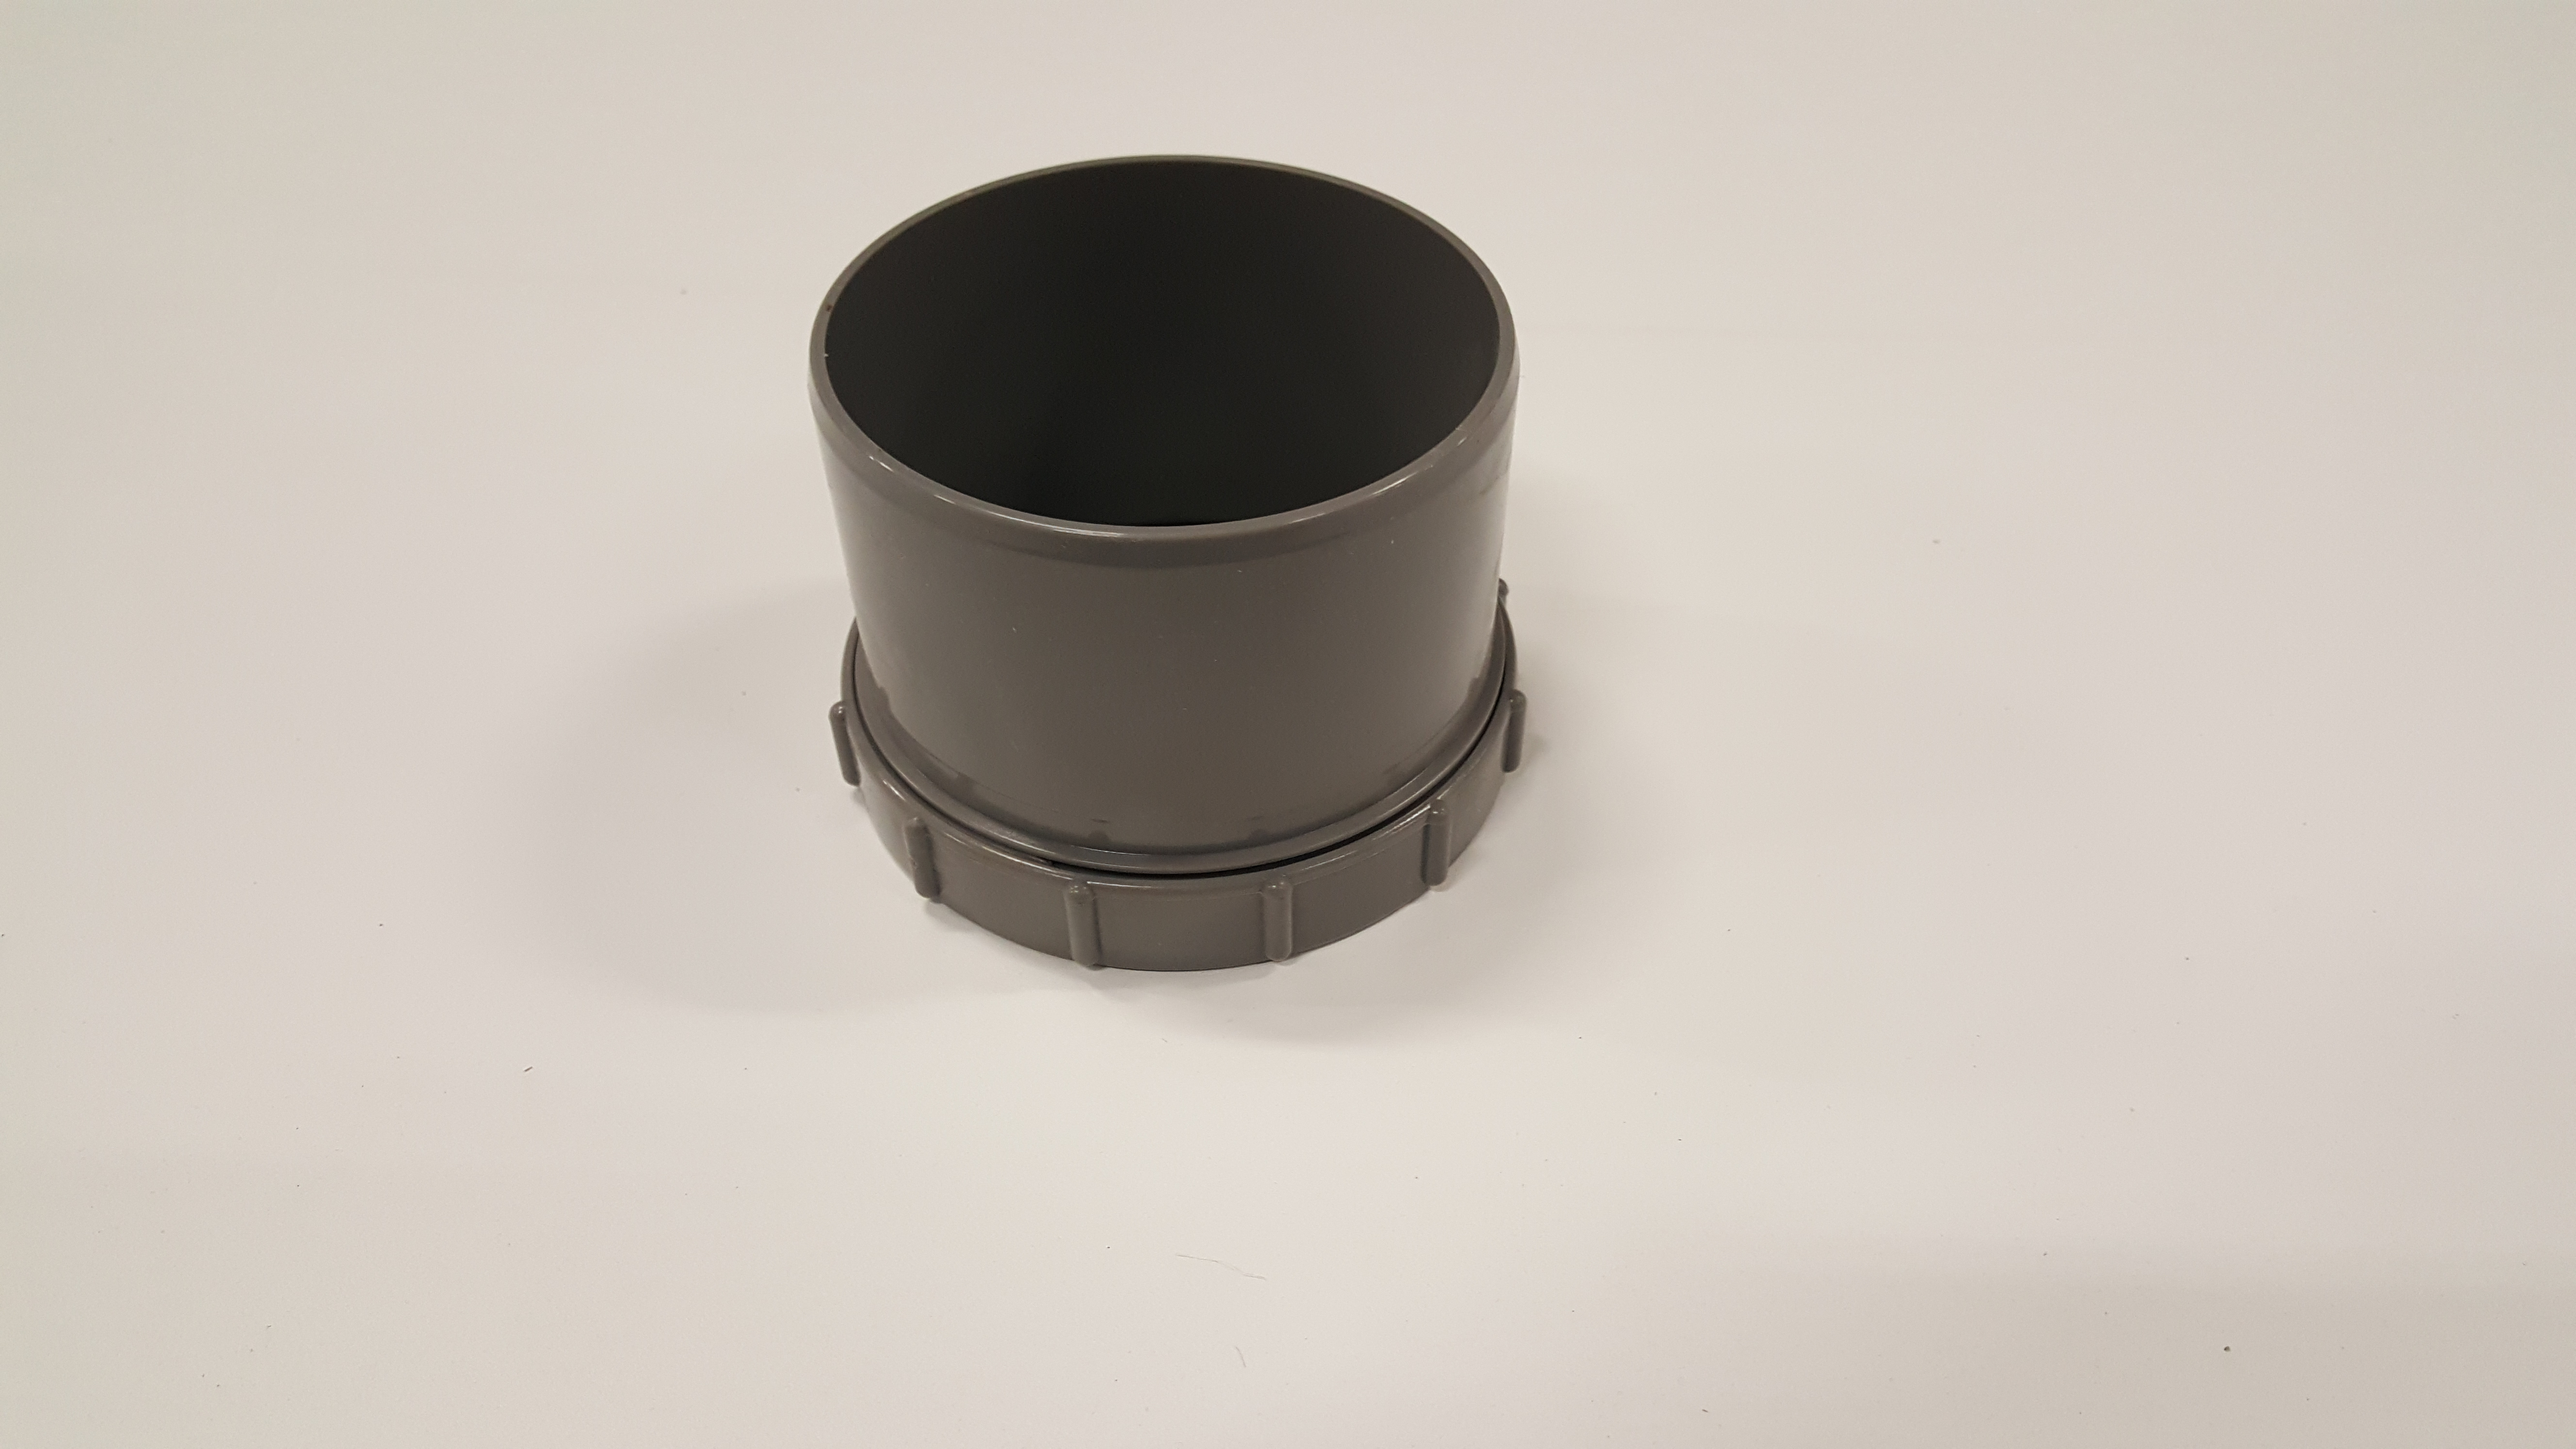 pvceindstukmetschroefdeksel110mm-1